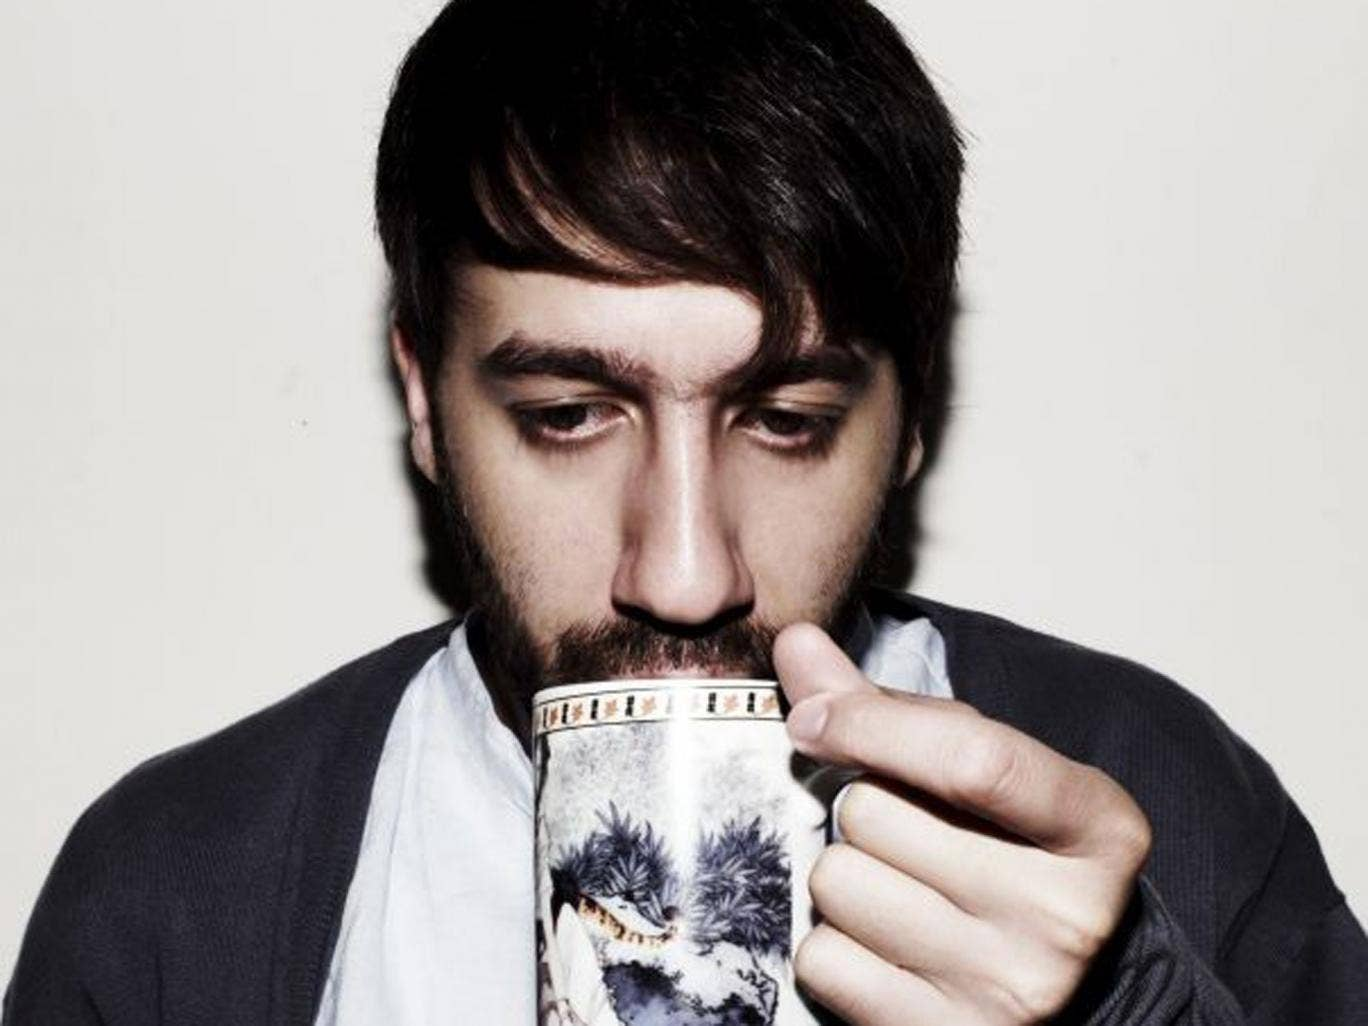 Berlin-based (naturally) UK producer Gold Panda